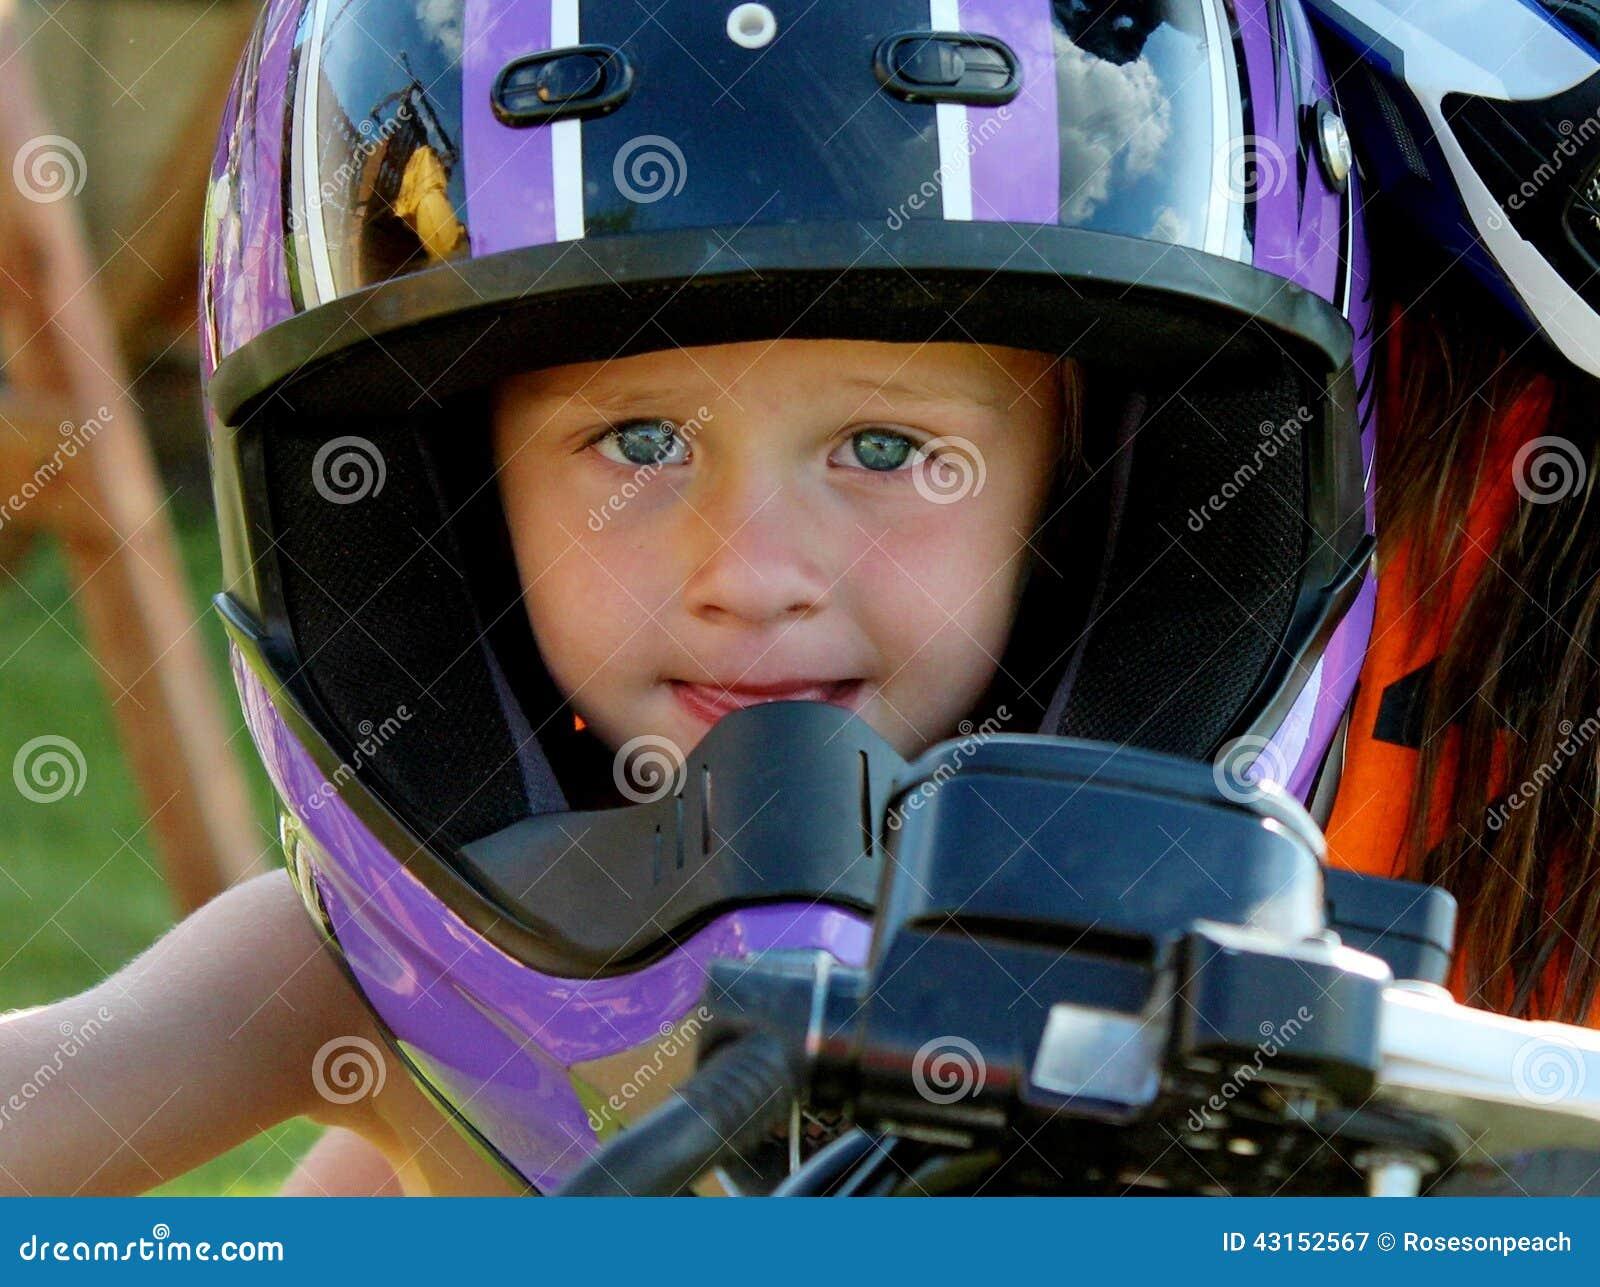 little boy on motorcycle - photo #32